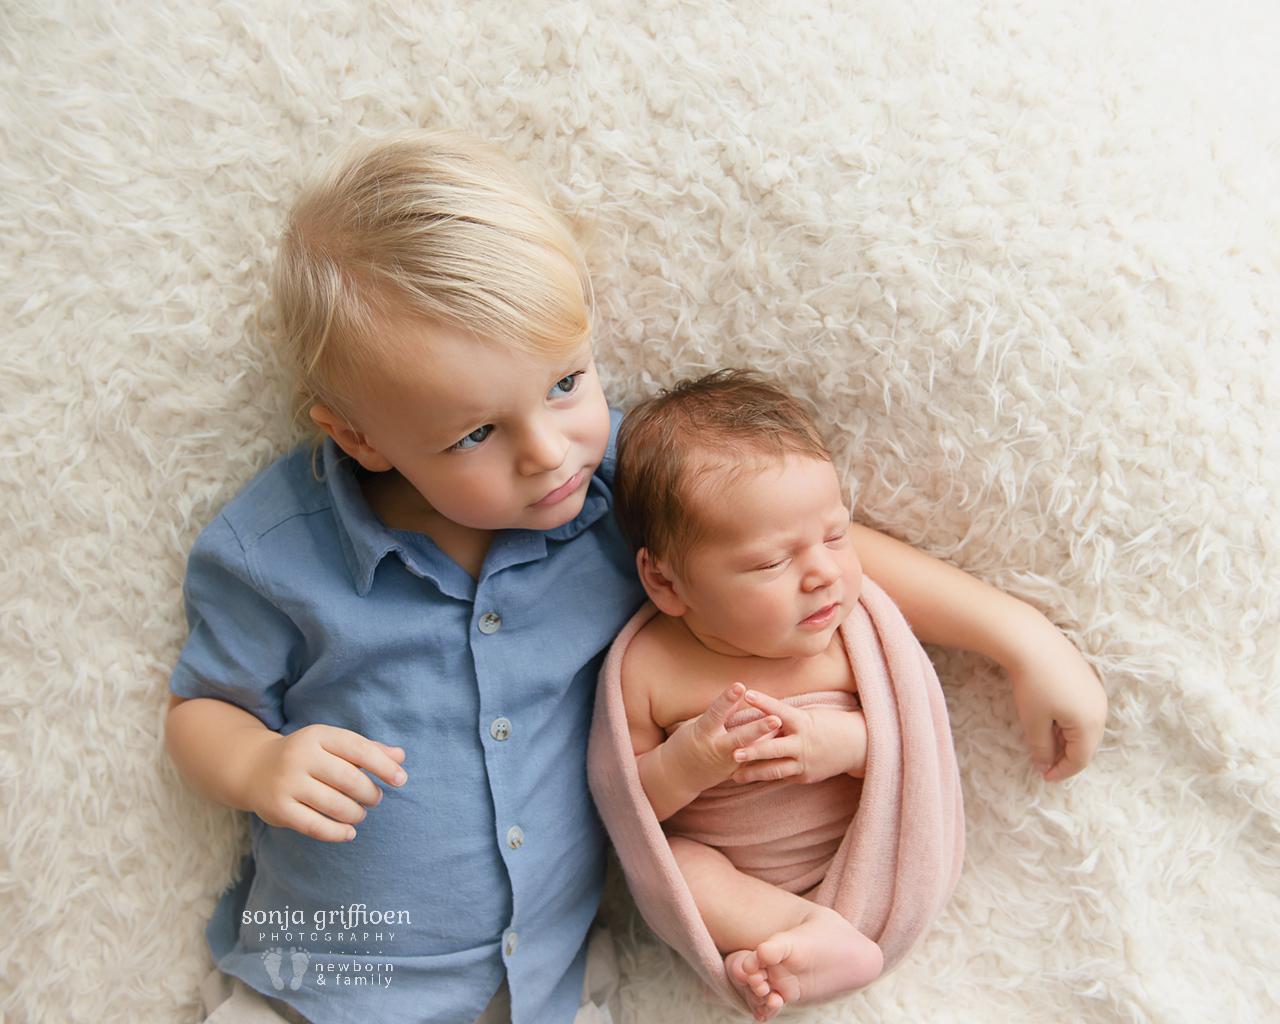 Cleo-Newborn-Brisbane-Newborn-Photographer-Sonja-Griffioen-01.jpg